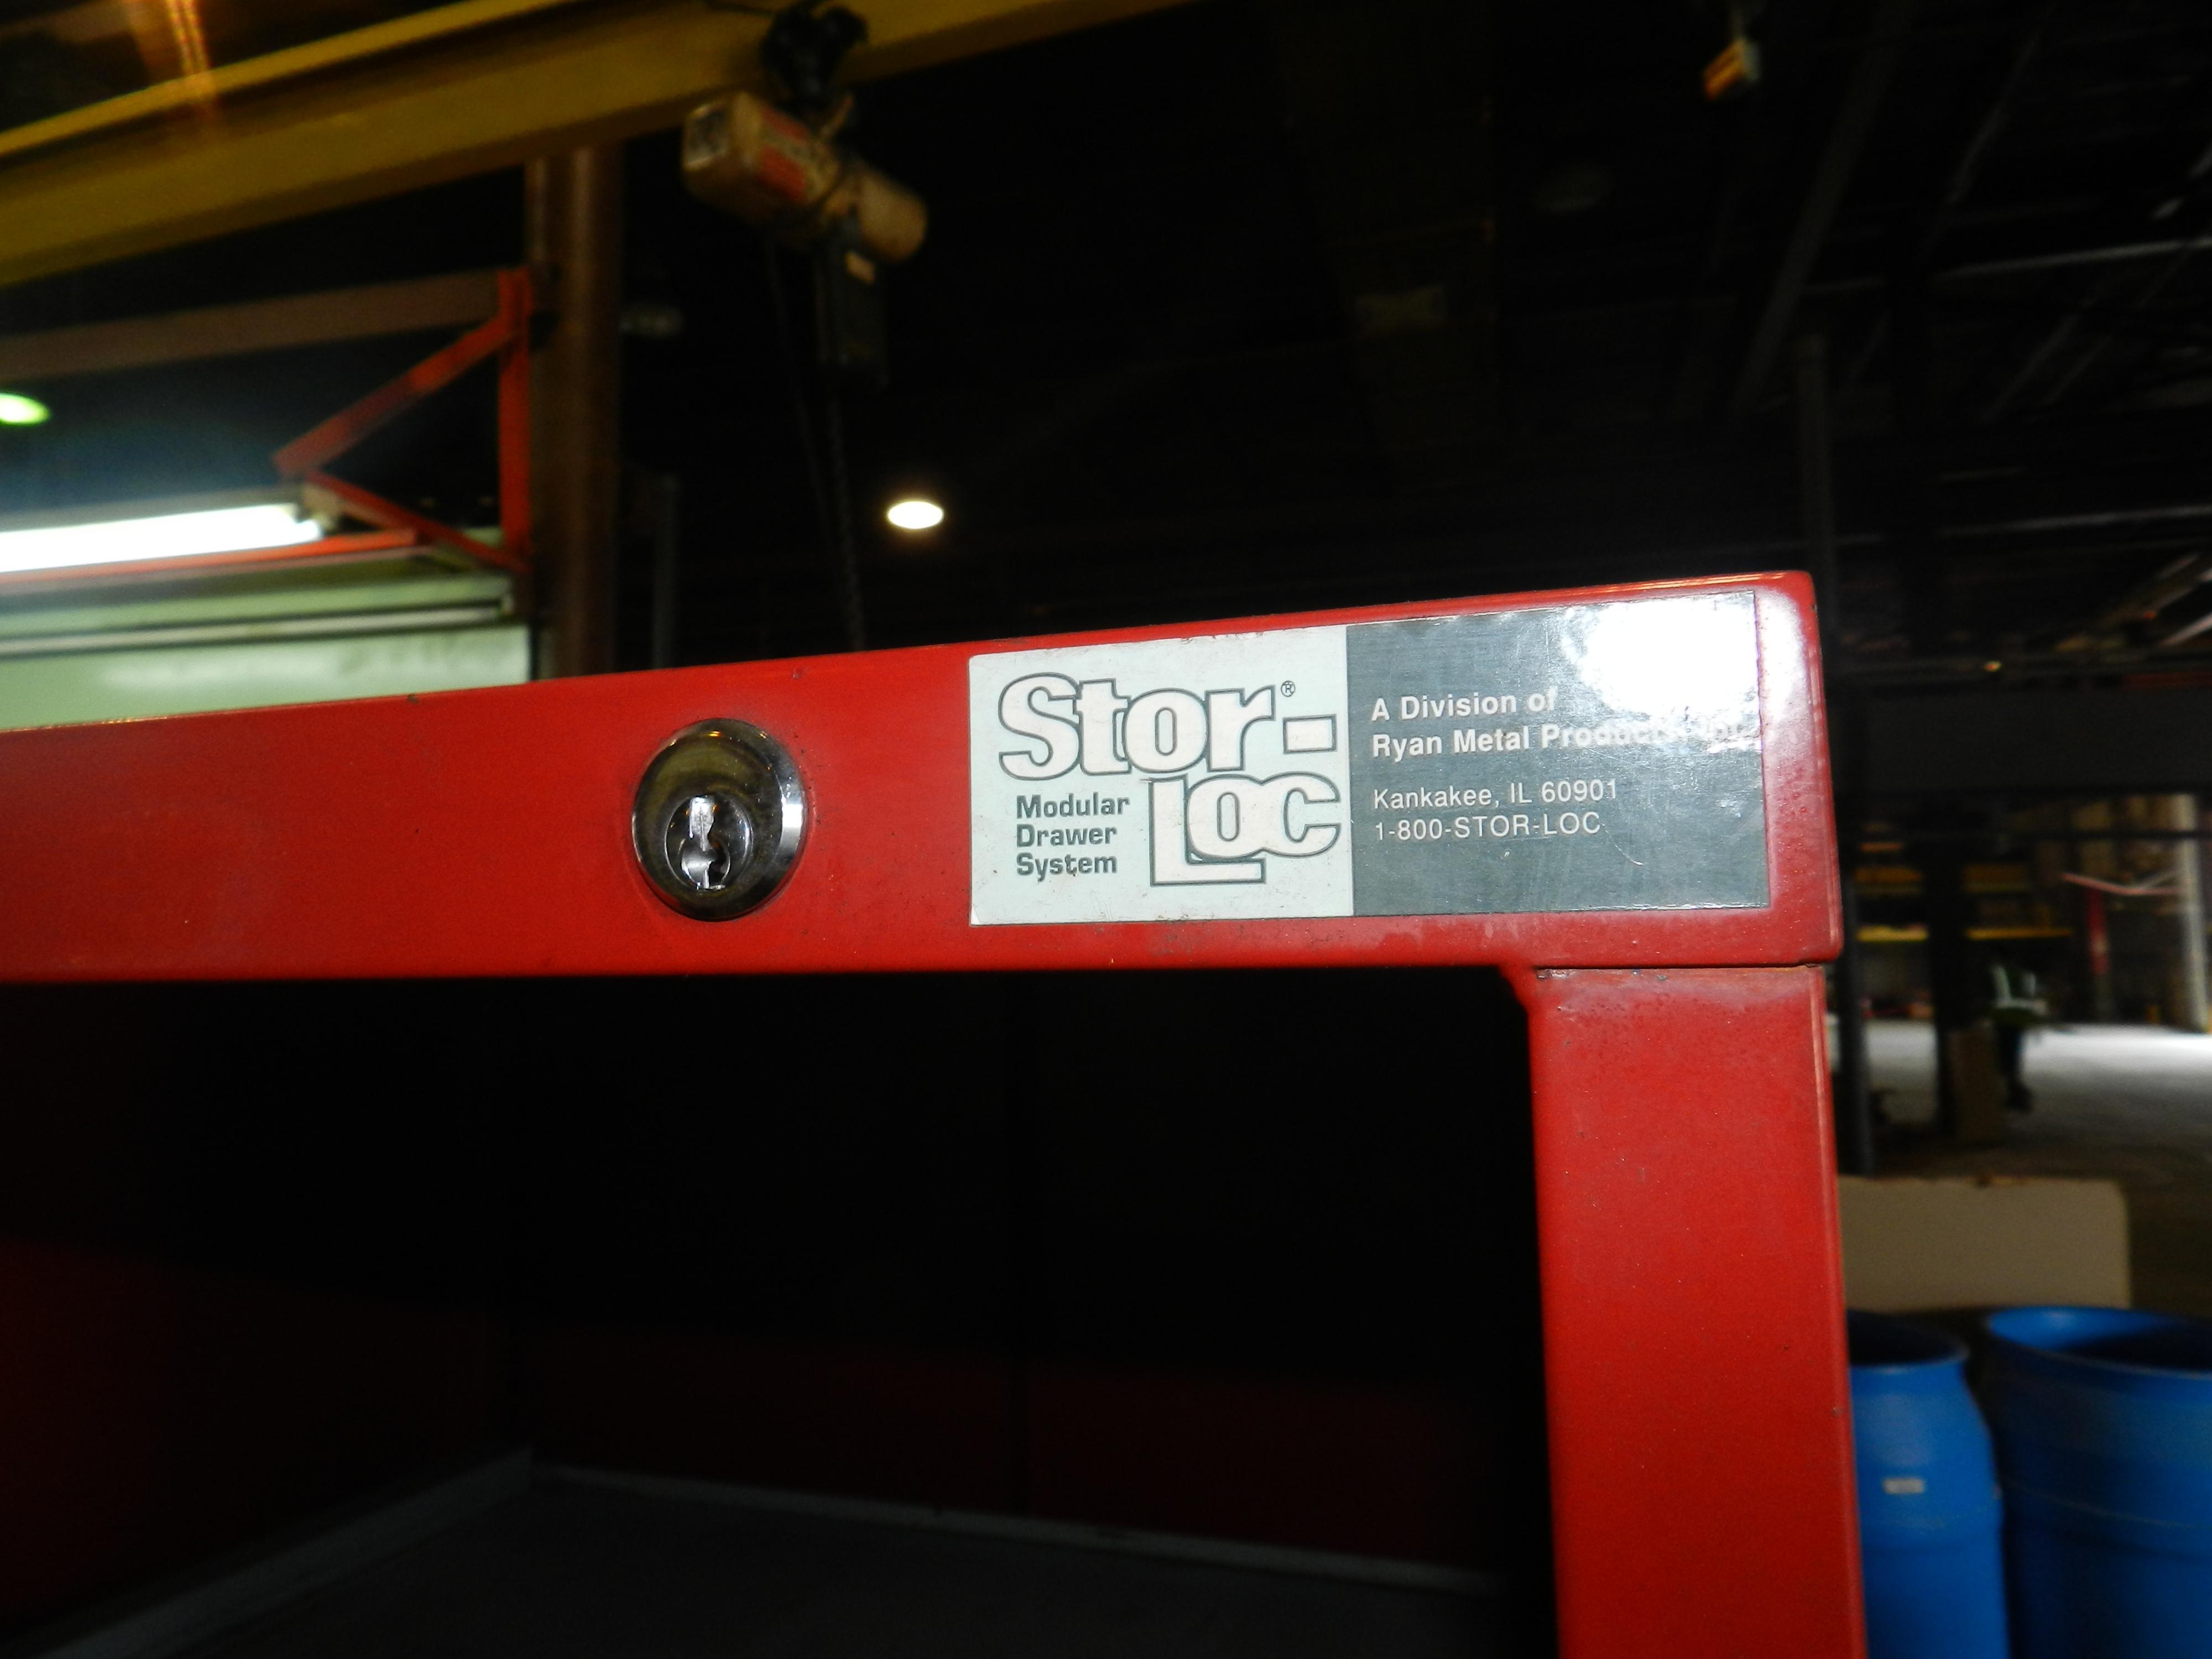 "Lot 74 - Stor-Loc Modular Drawer System 29"" x 28"" x 65.5"" Tool Cabinet"